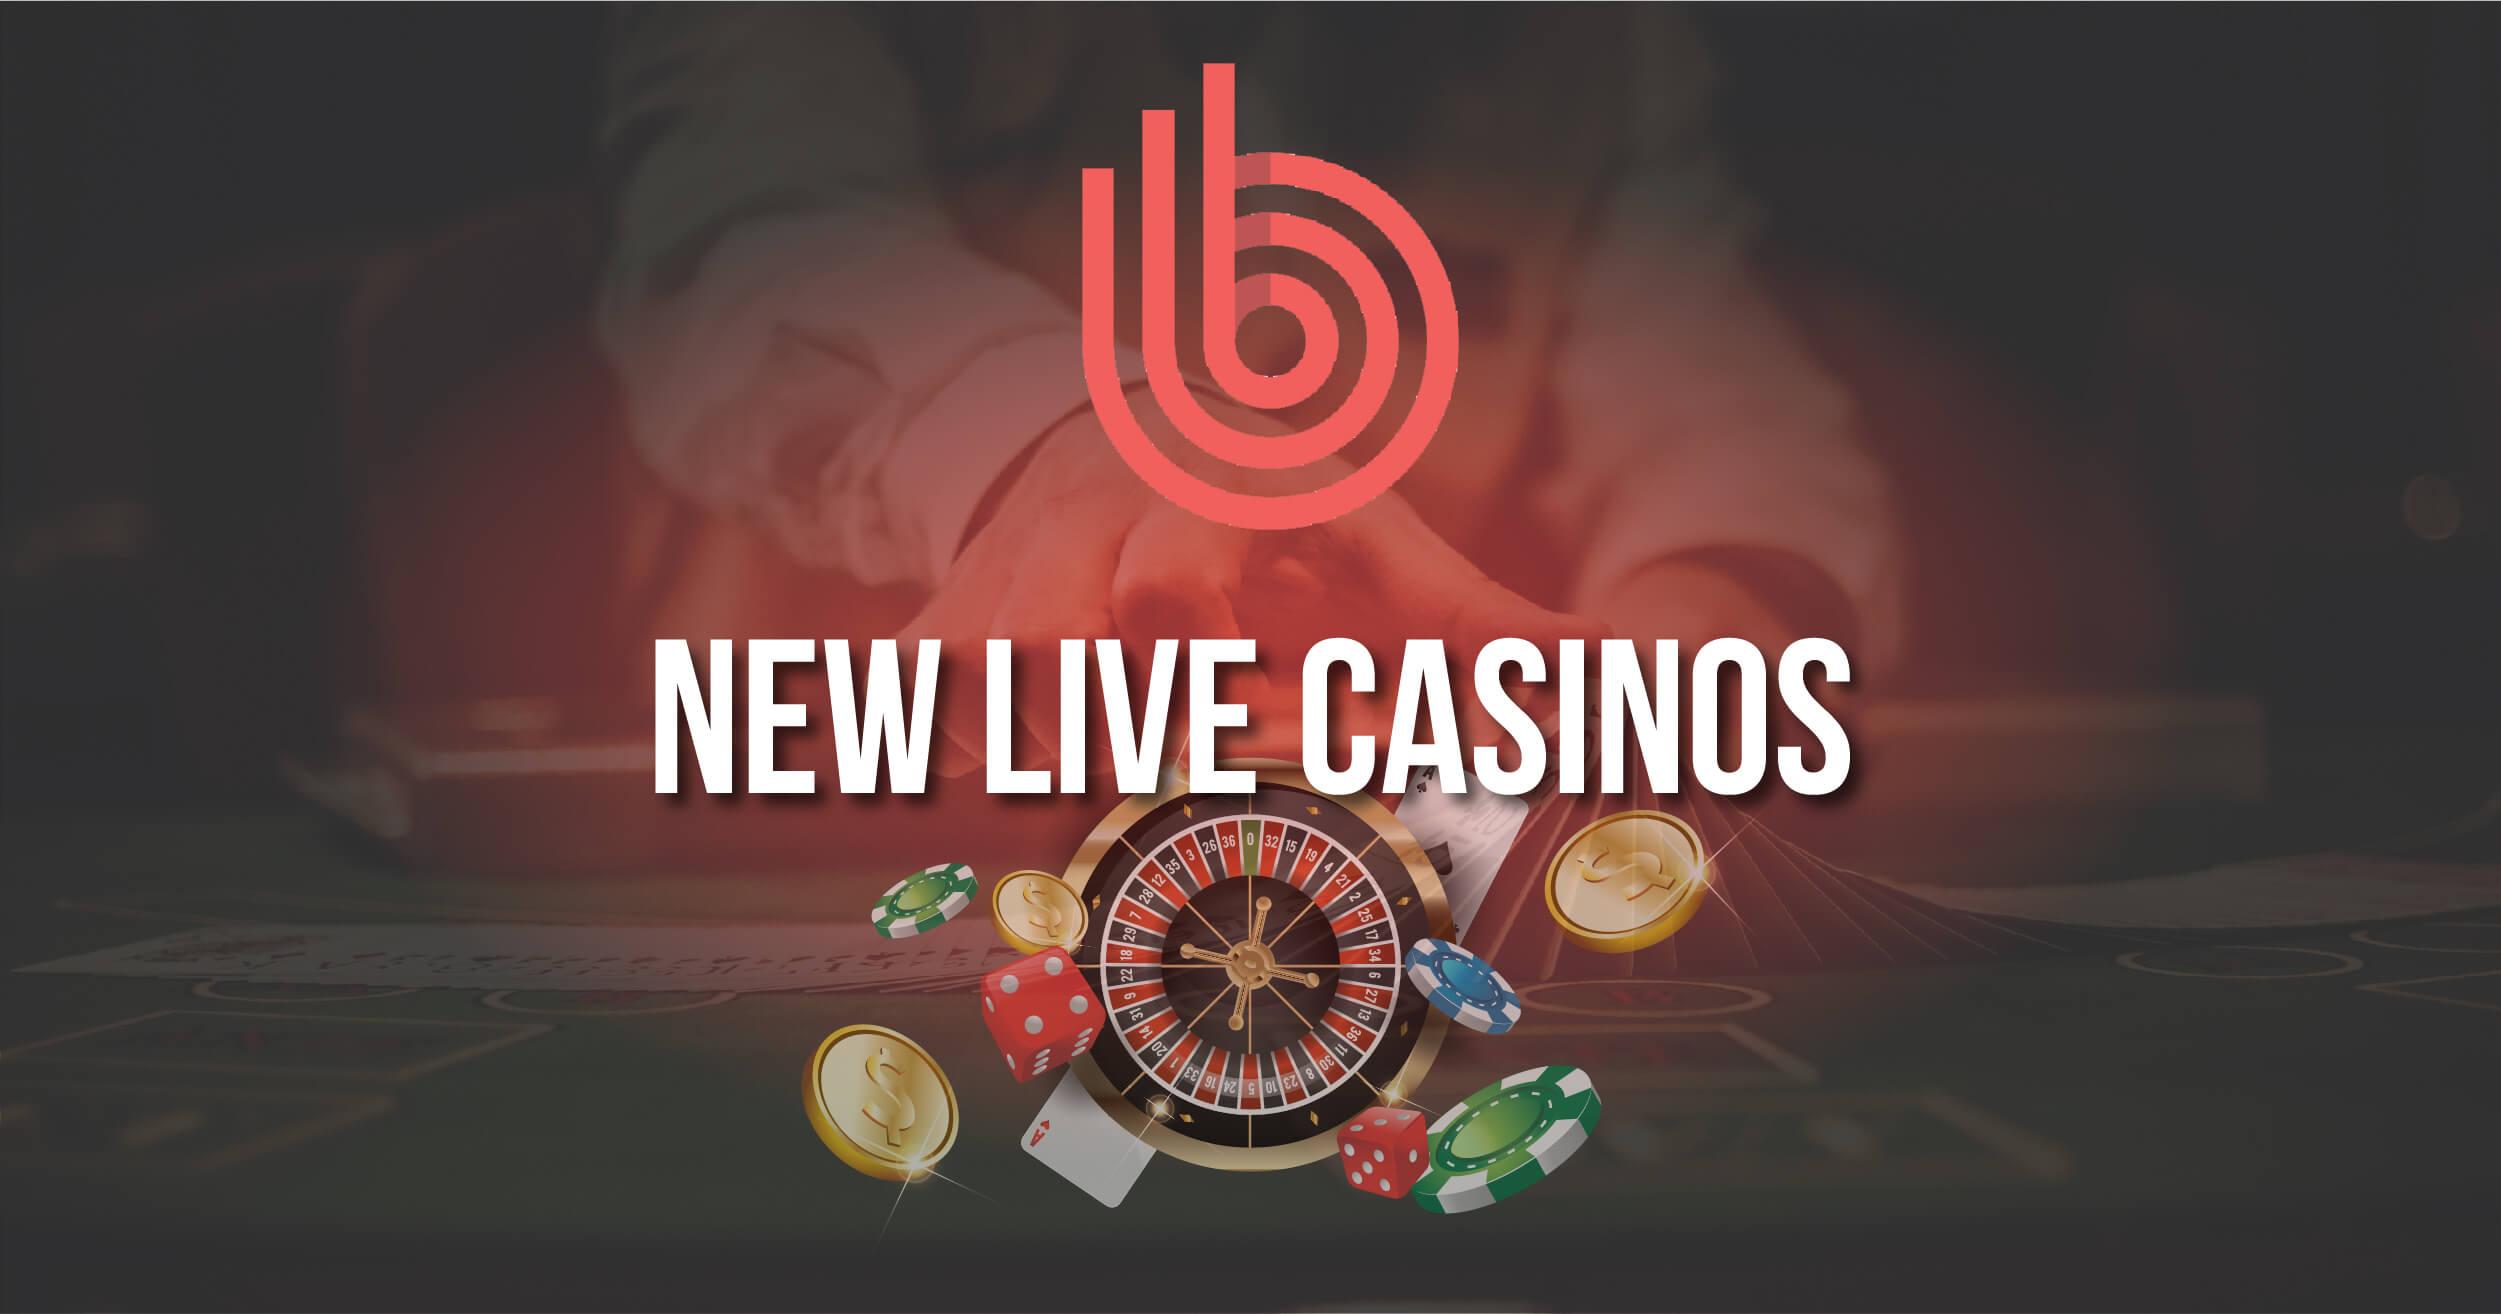 Best New Live Casinos